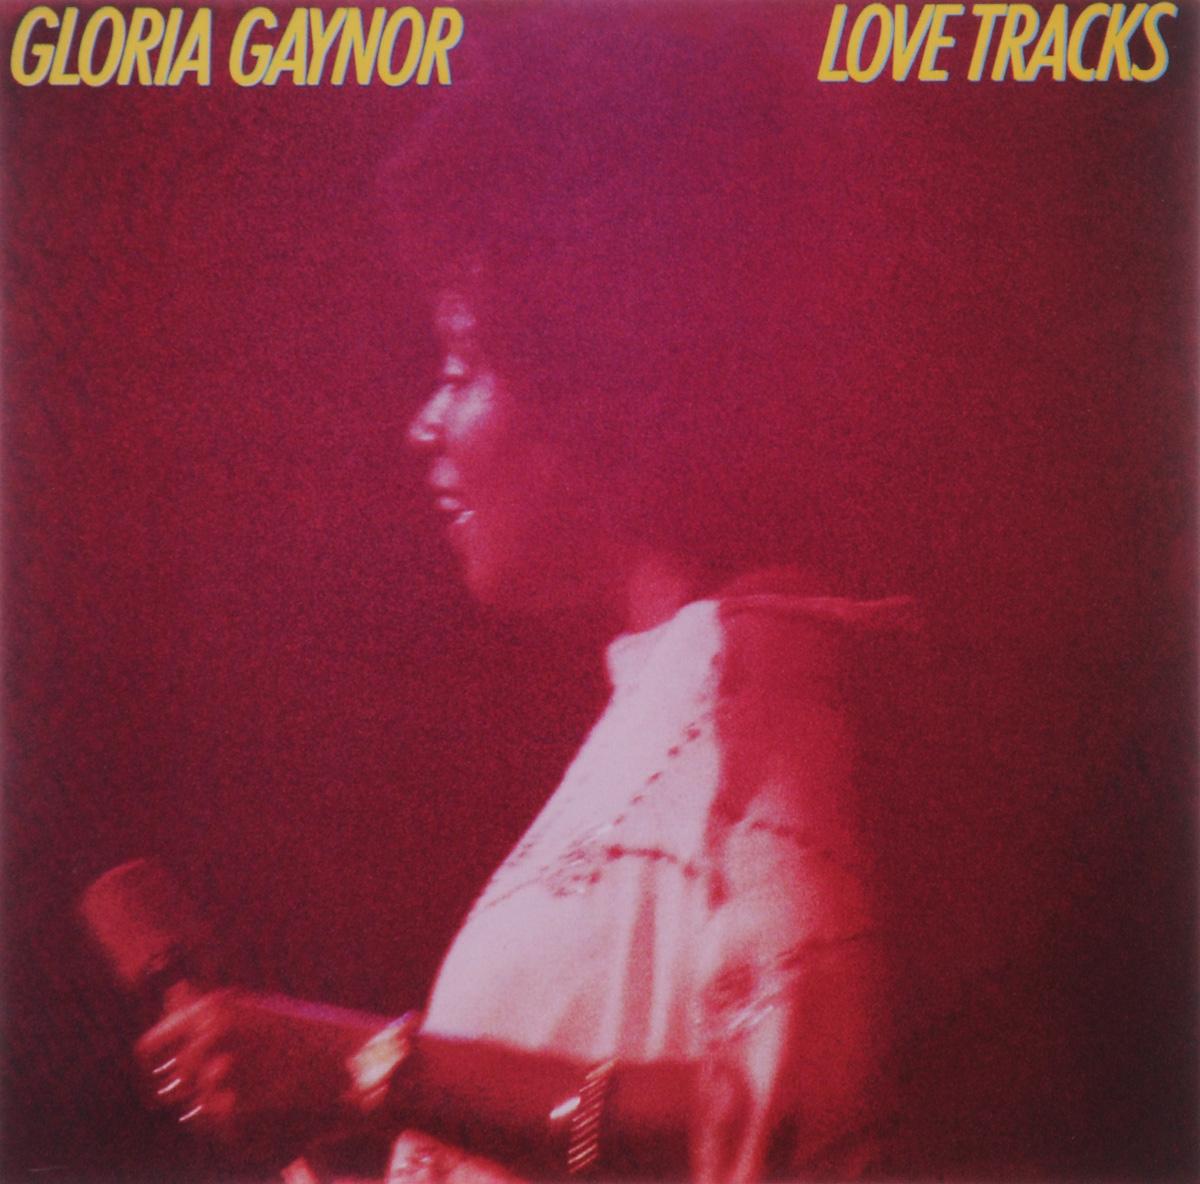 Фото - Глория Гейнор Gloria Gaynor. Love Tracks глория эстэфан gloria estefan alma caribena caribbean soul